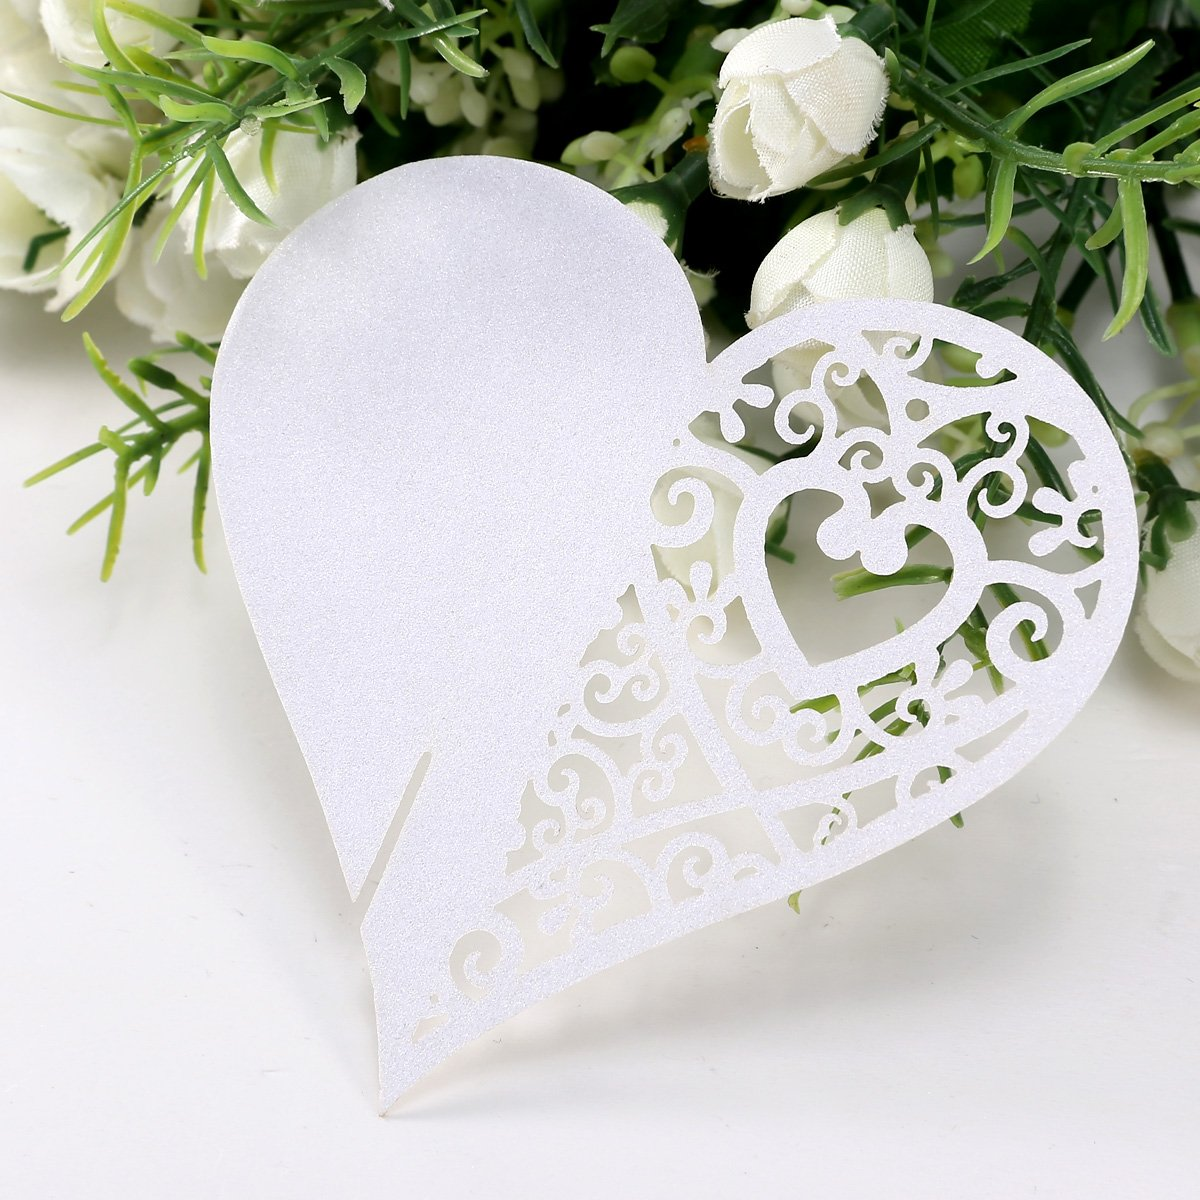 X Carte De Verre Porte Nom Marque Place Coeur Blanc Mariage Fête - Porte nom mariage